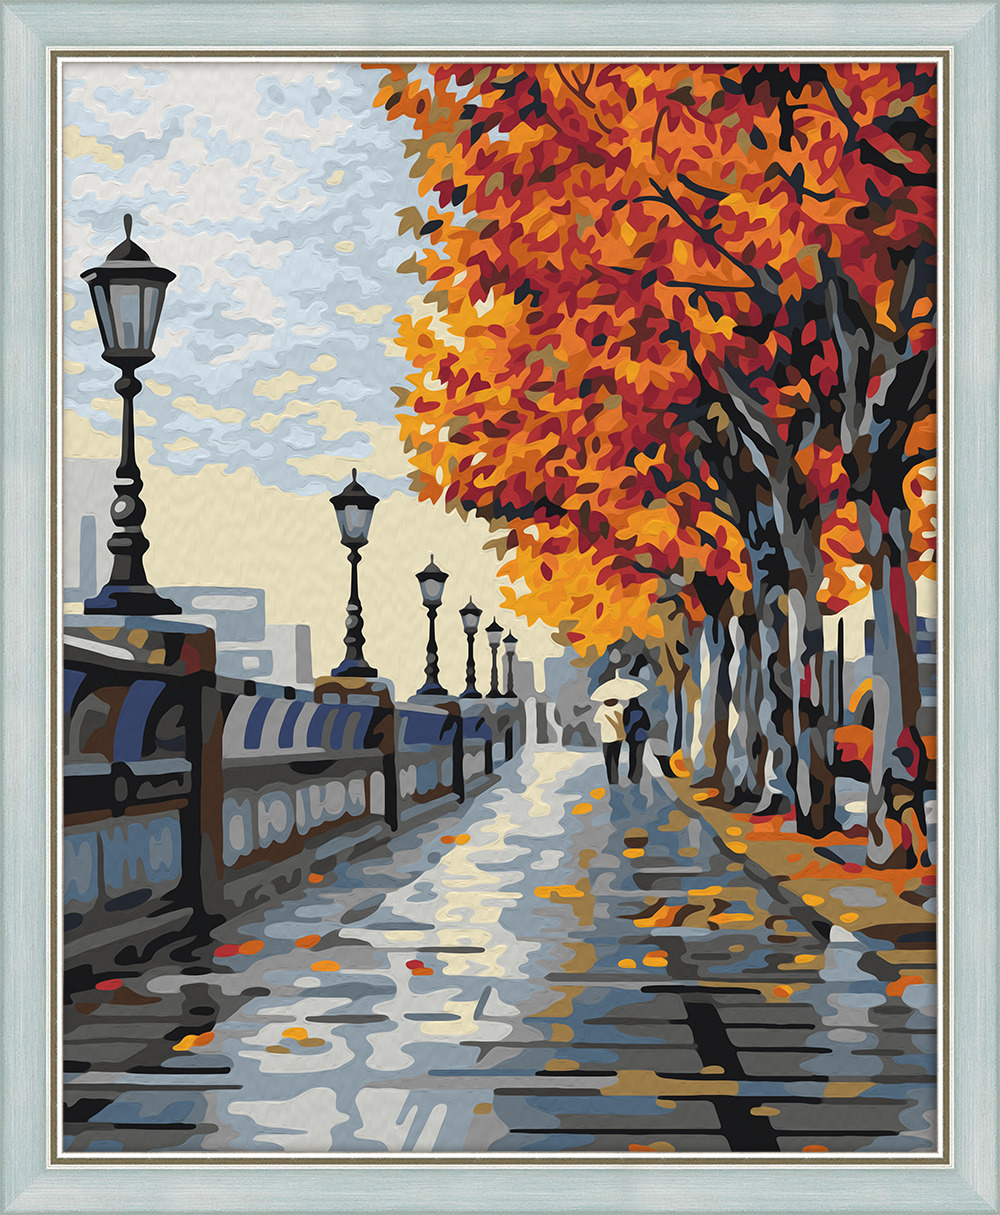 Набор для рисования по номерам Мосфа Осенняя прогулка, 40 х 50 см